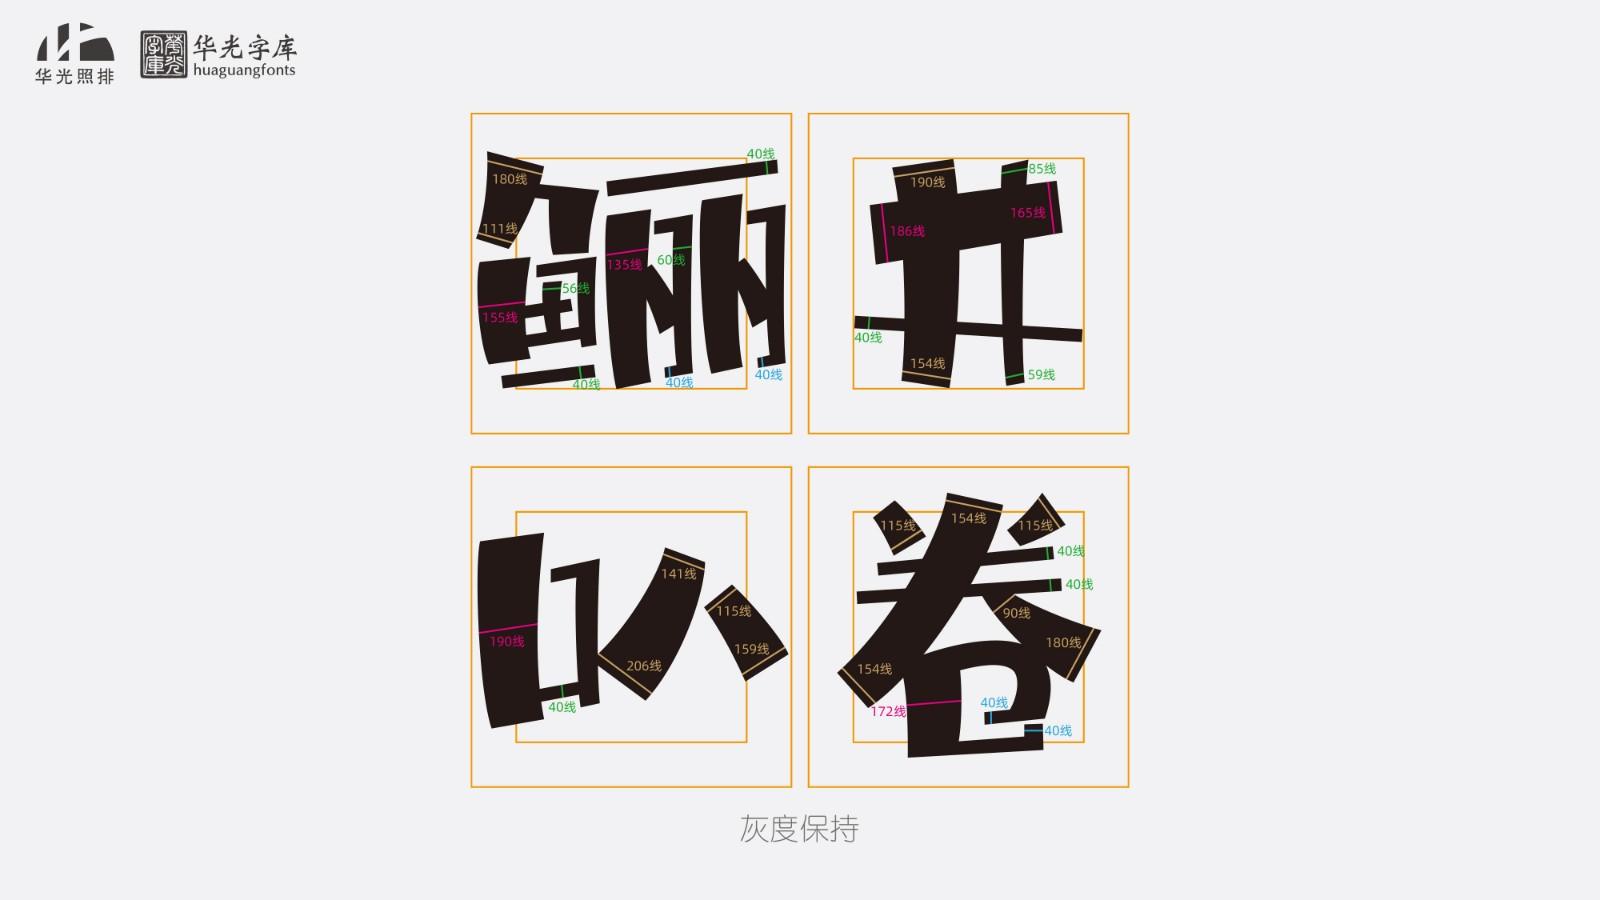 https://ft-bk1.oss-cn-zhangjiakou.aliyuncs.com/Public/Uploads/img/n_content_20201210105936_8775.jpg